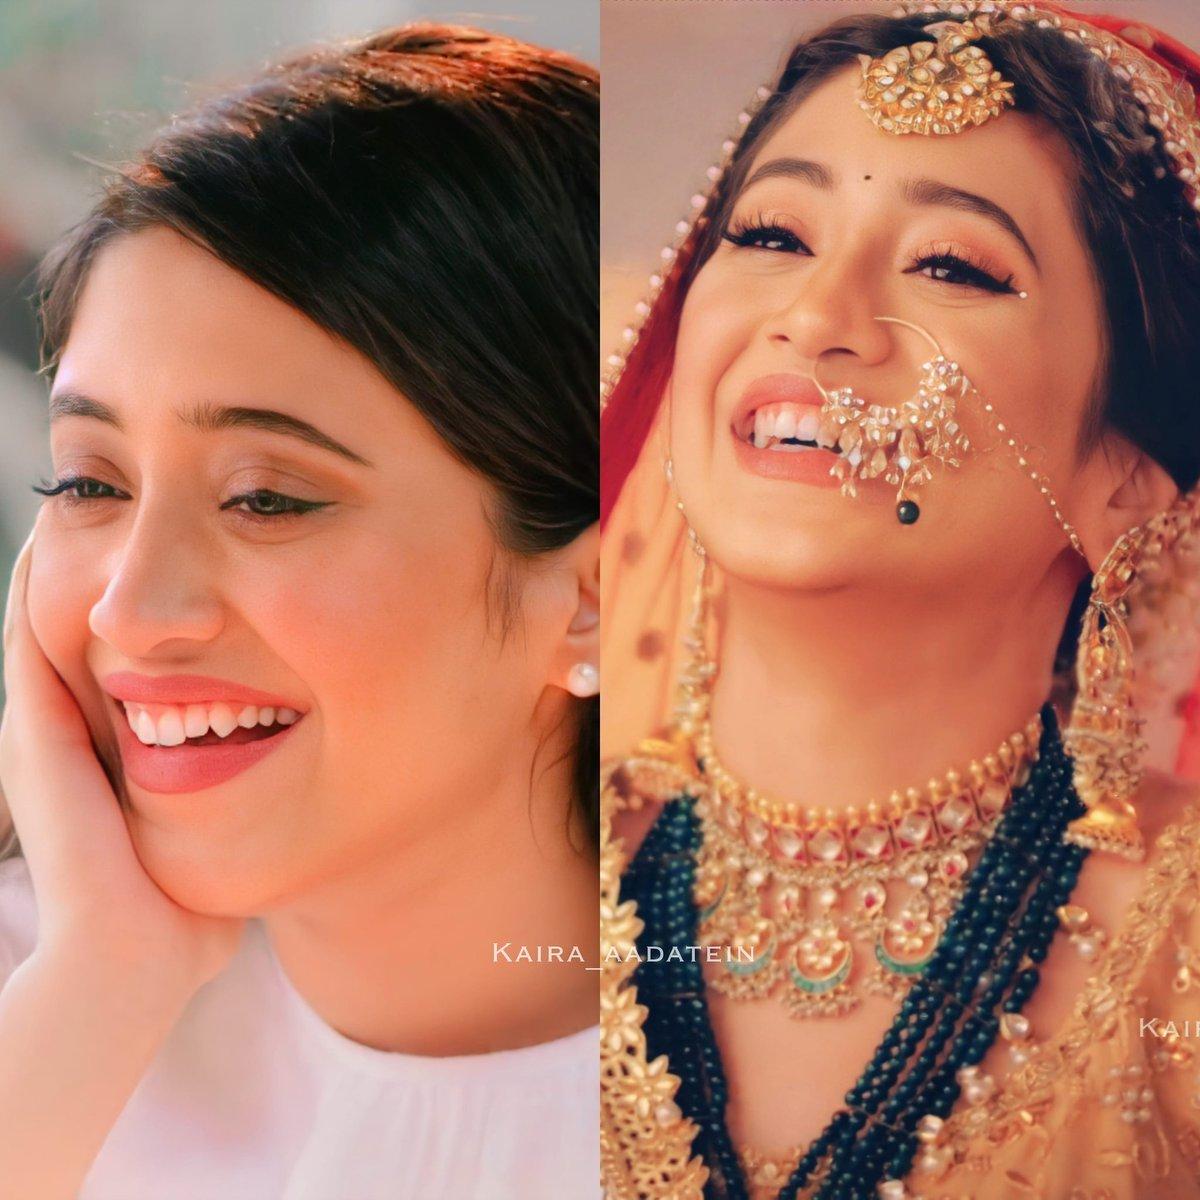 Kinna Sona, Kinna Sona Tainu Rab Ne Banaya, Jee Kare Dekhda Rawaan @shivangijoshi10  #ShivangiJoshi #Naira #yrkkh https://t.co/90zzTuGN3T